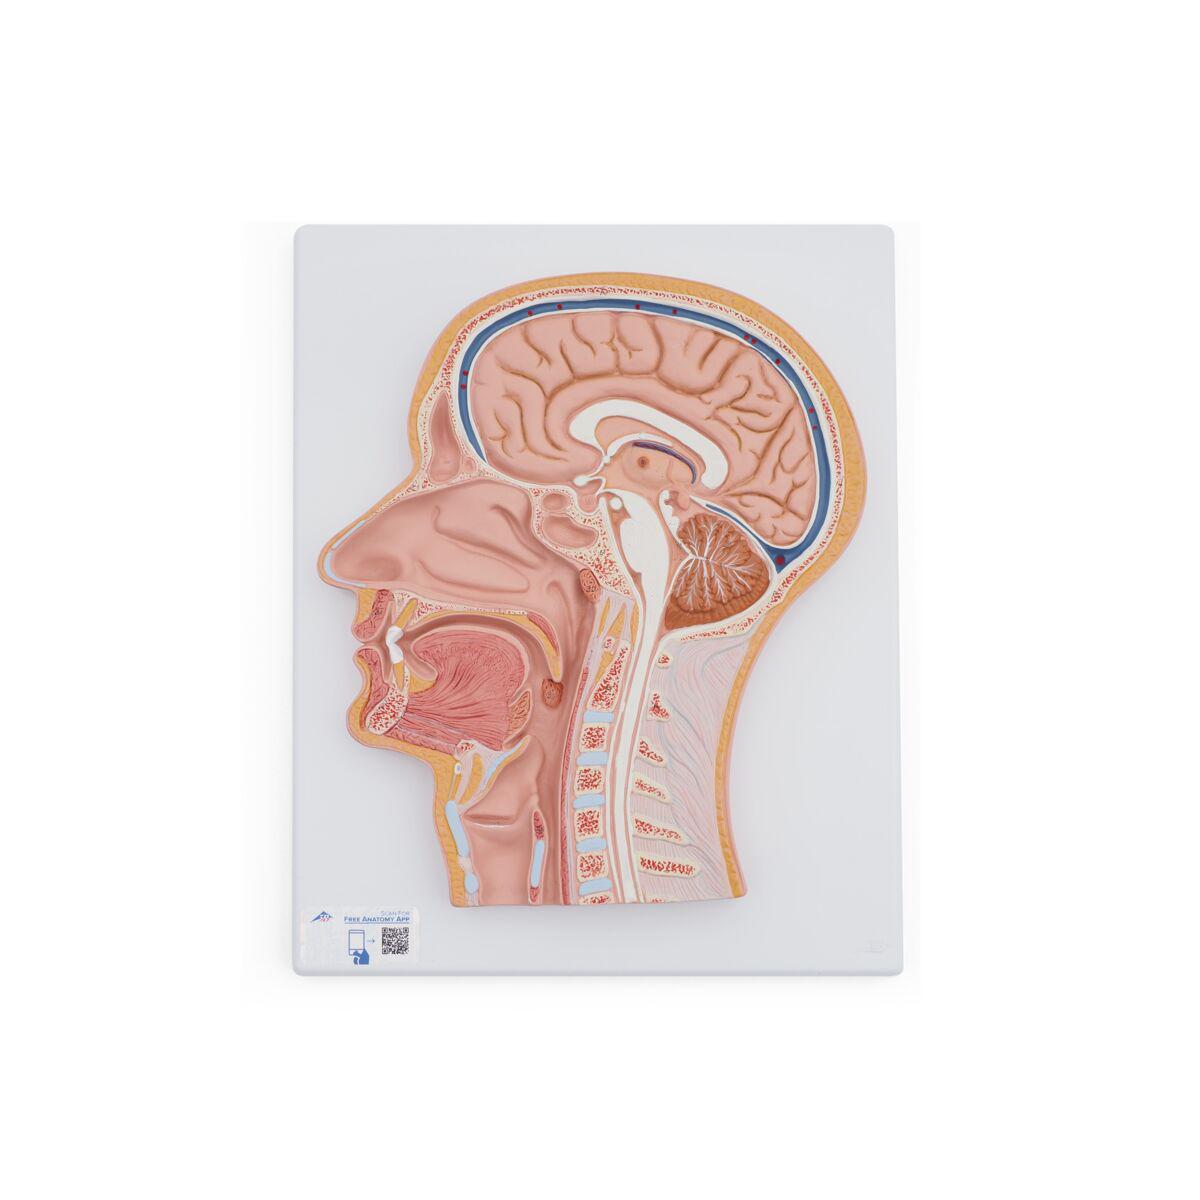 Anatomical Teaching Models | Plastic Anatomy Models | Median Section ...